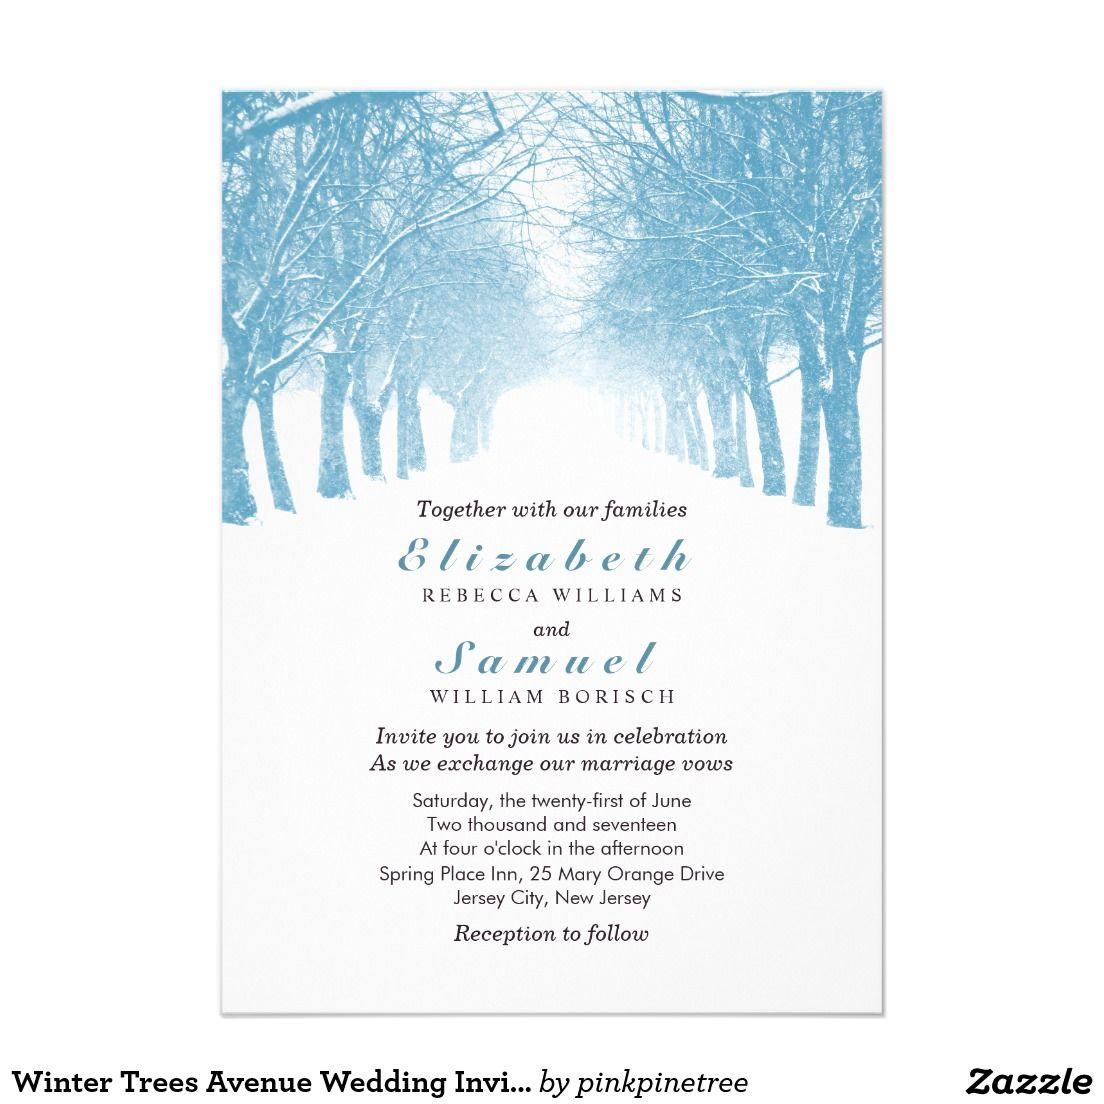 wedding invitations groupon wedding invitations groupon images wedding and party invitation - Groupon Wedding Invitations